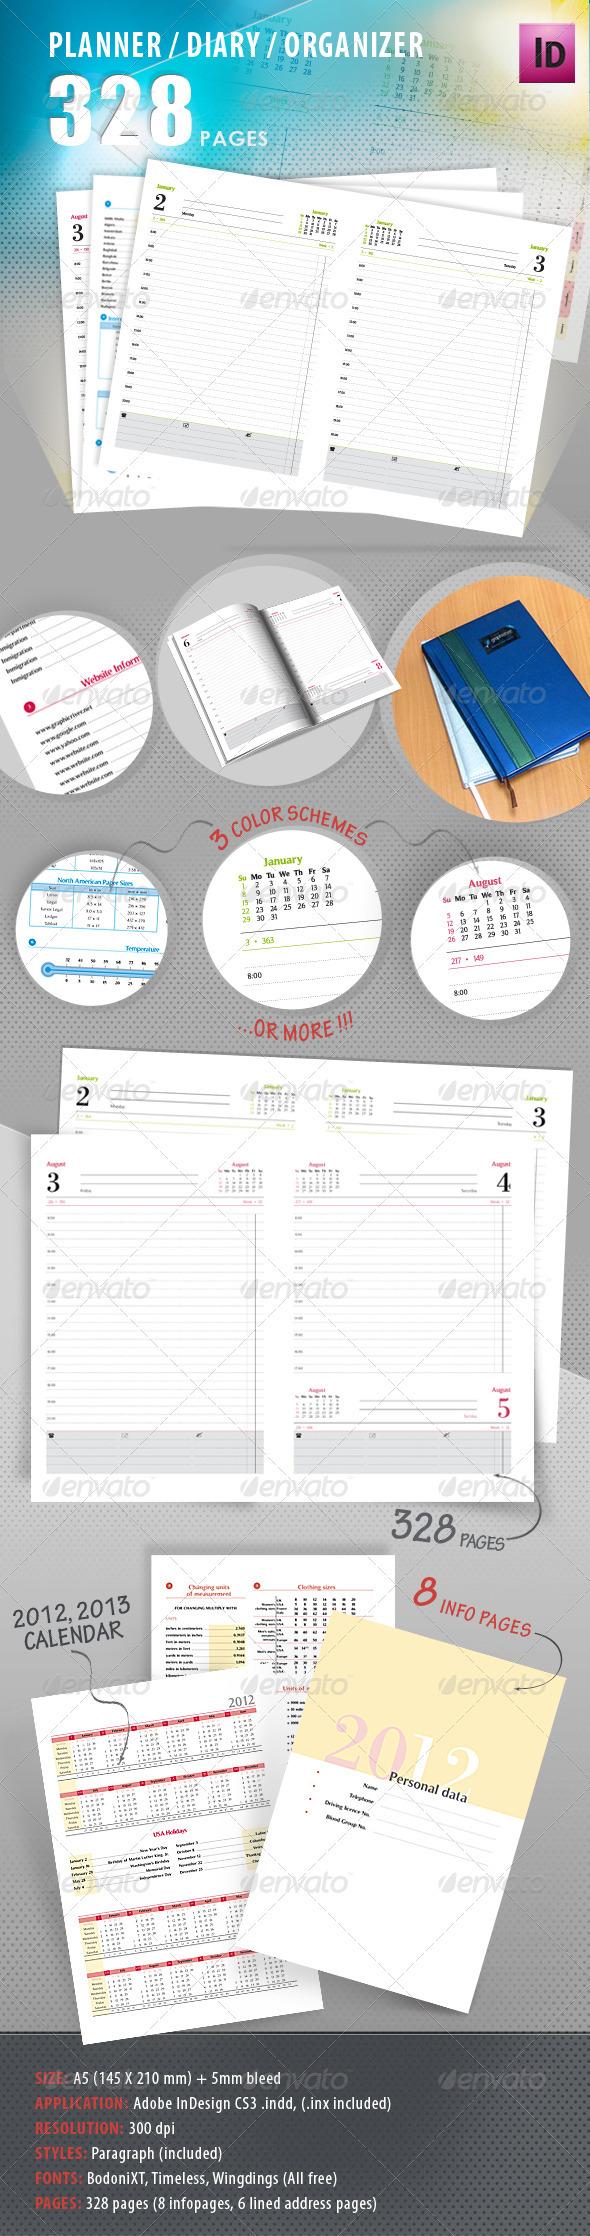 GraphicRiver Planner Diary Organizer 546336